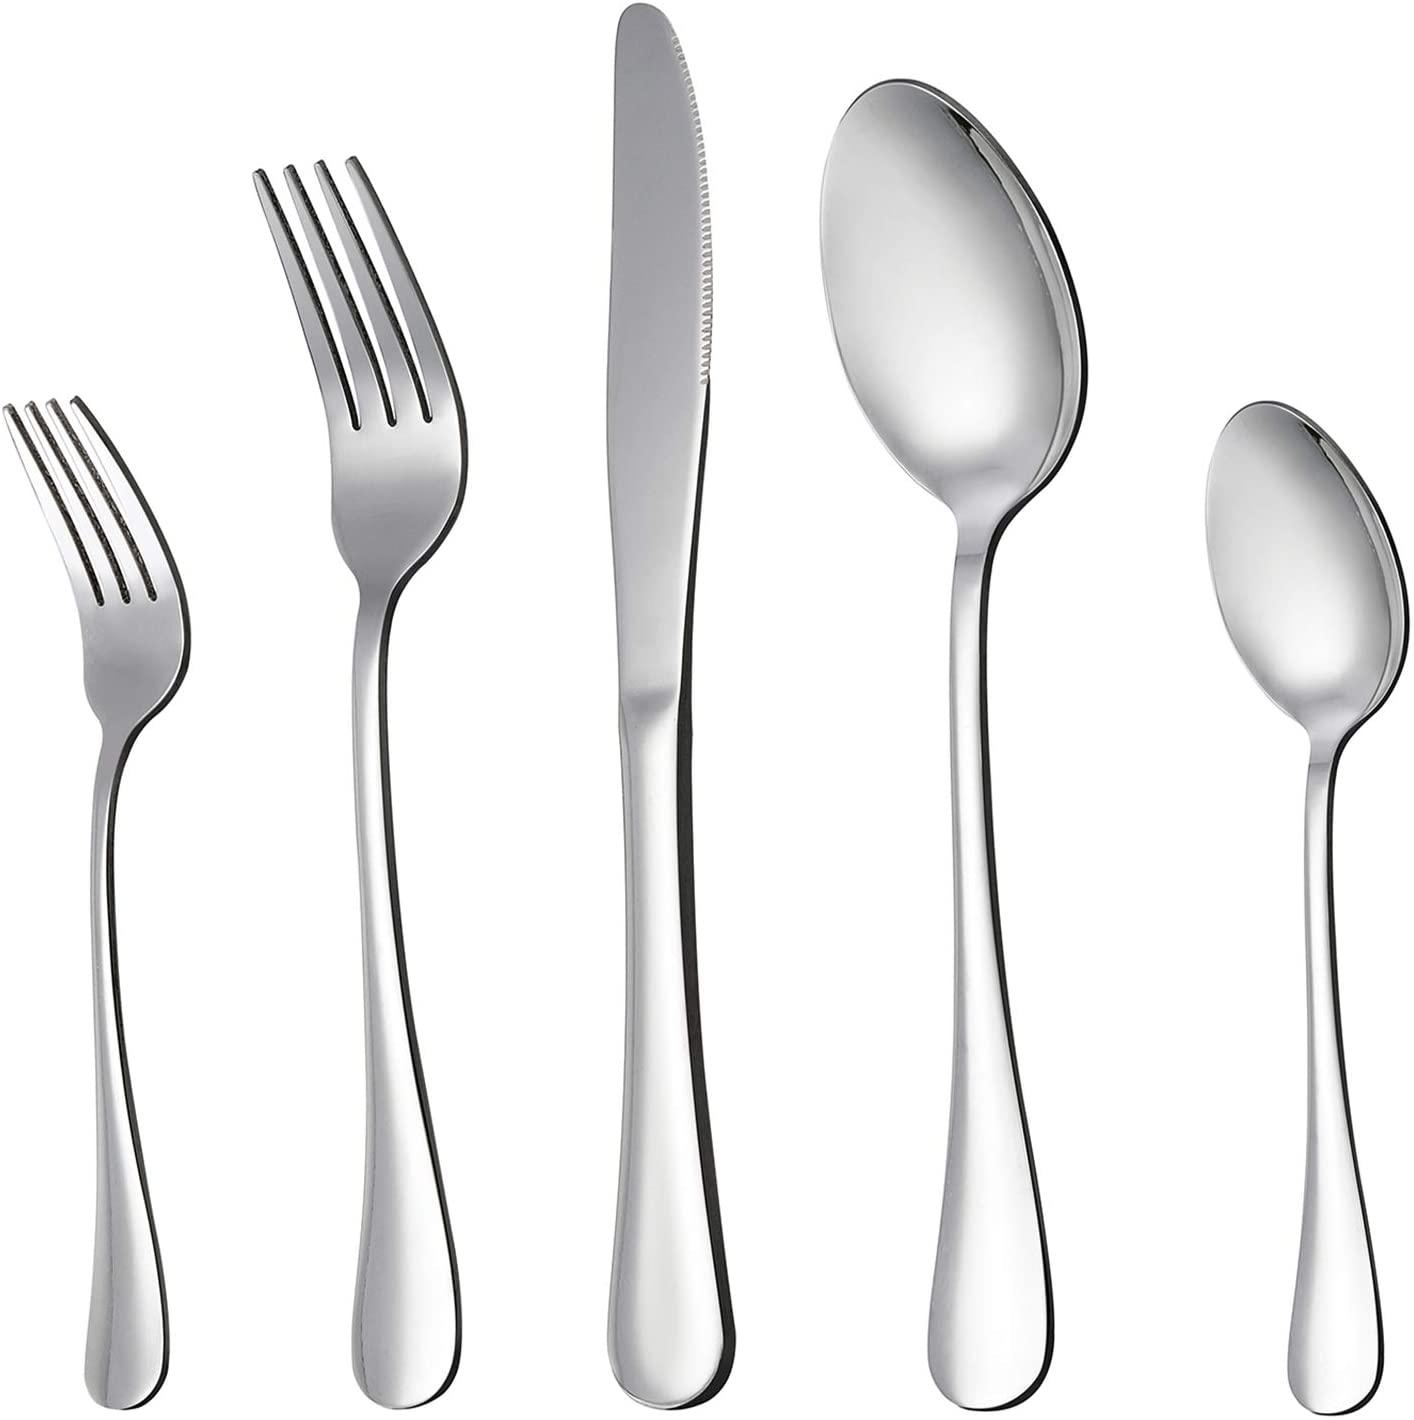 LIANYU 20 Piece Stainless Steel Silverware Set